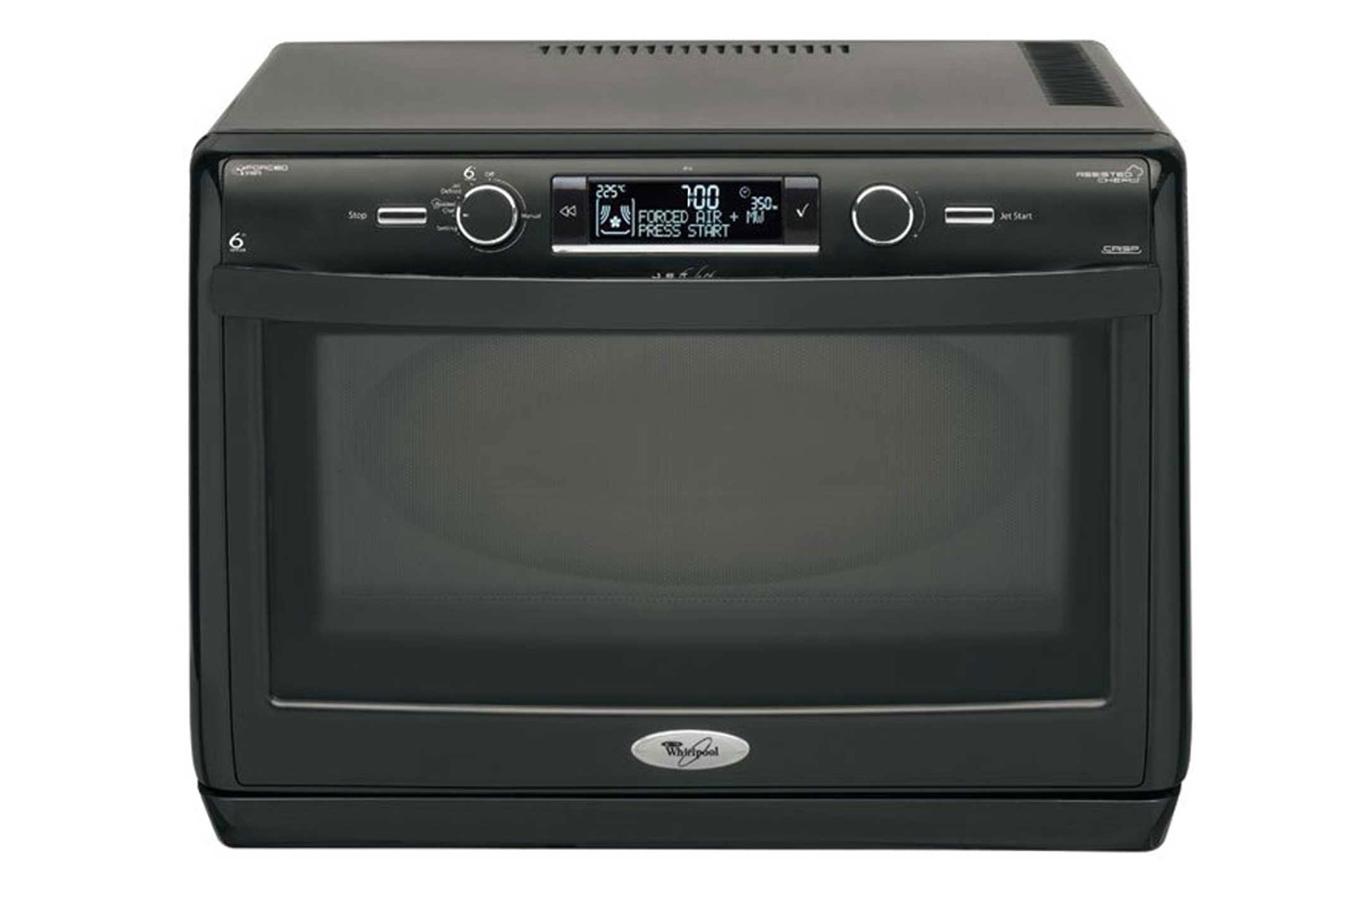 micro ondes combin whirlpool jt378nb crisp crisp 3265056 darty. Black Bedroom Furniture Sets. Home Design Ideas